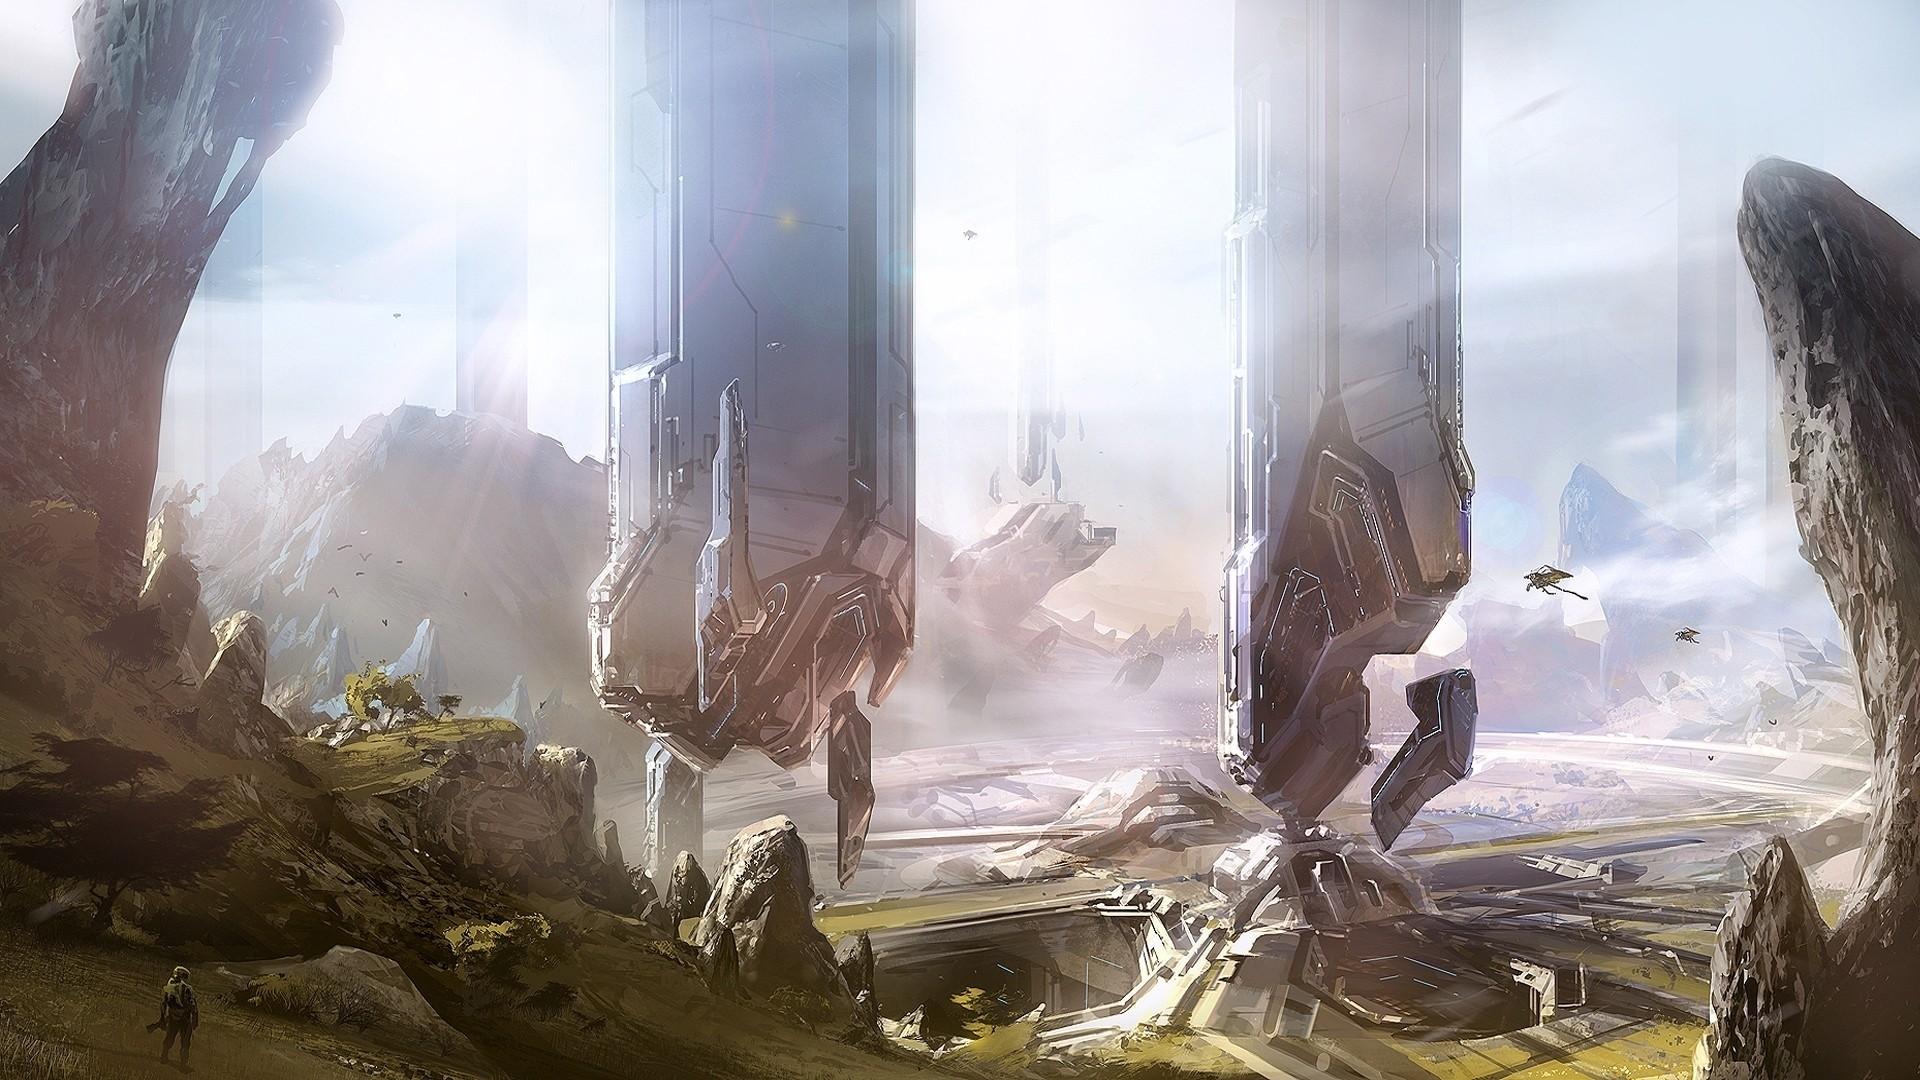 Res: 1920x1080, Title : wallpaper : video games, concept art, mythology, halo 4,  screenshot. Dimension : 1920 x 1080. File Type : JPG/JPEG